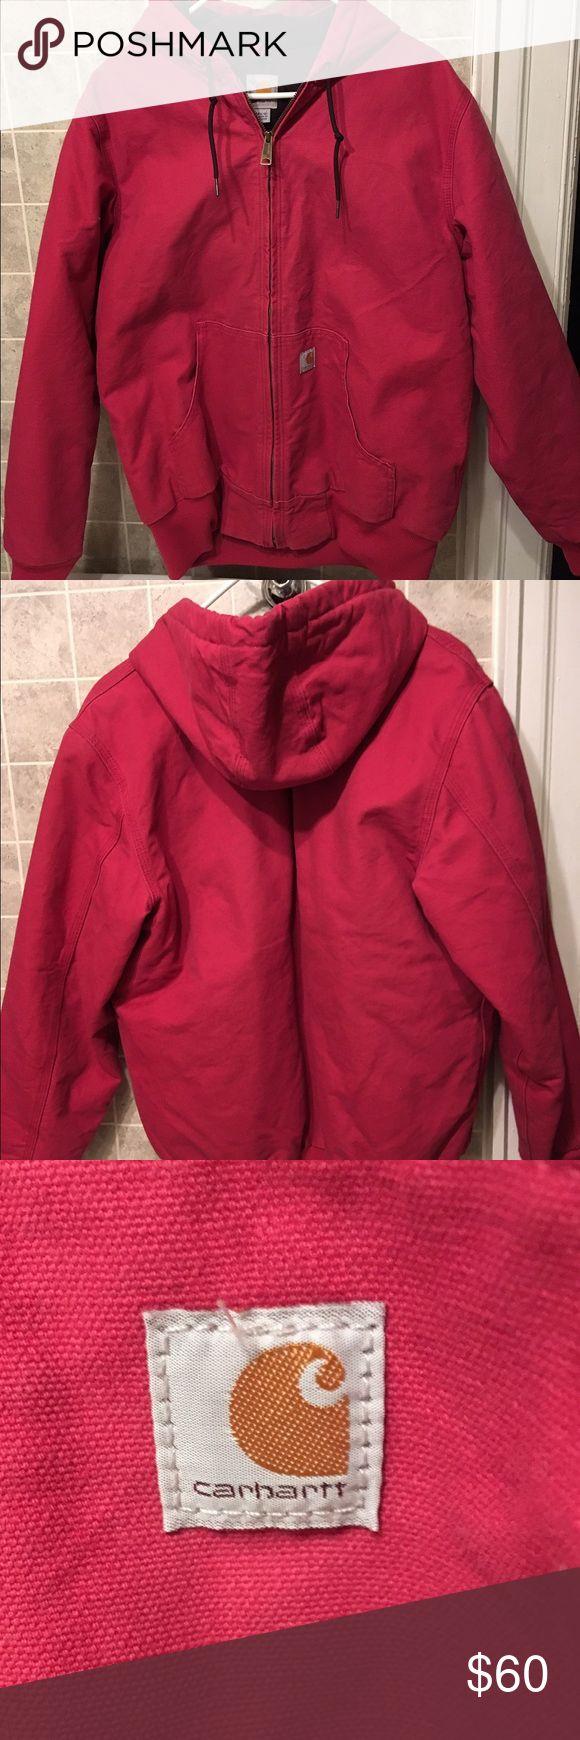 SALE NWOT women's pink Carhartt hood jacket size M NWOT women's pink classic Carhartt hooded zip up jacket with Carhartt logo size medium 8-10. Runs slightly big. Never worn. Carhartt Jackets & Coats